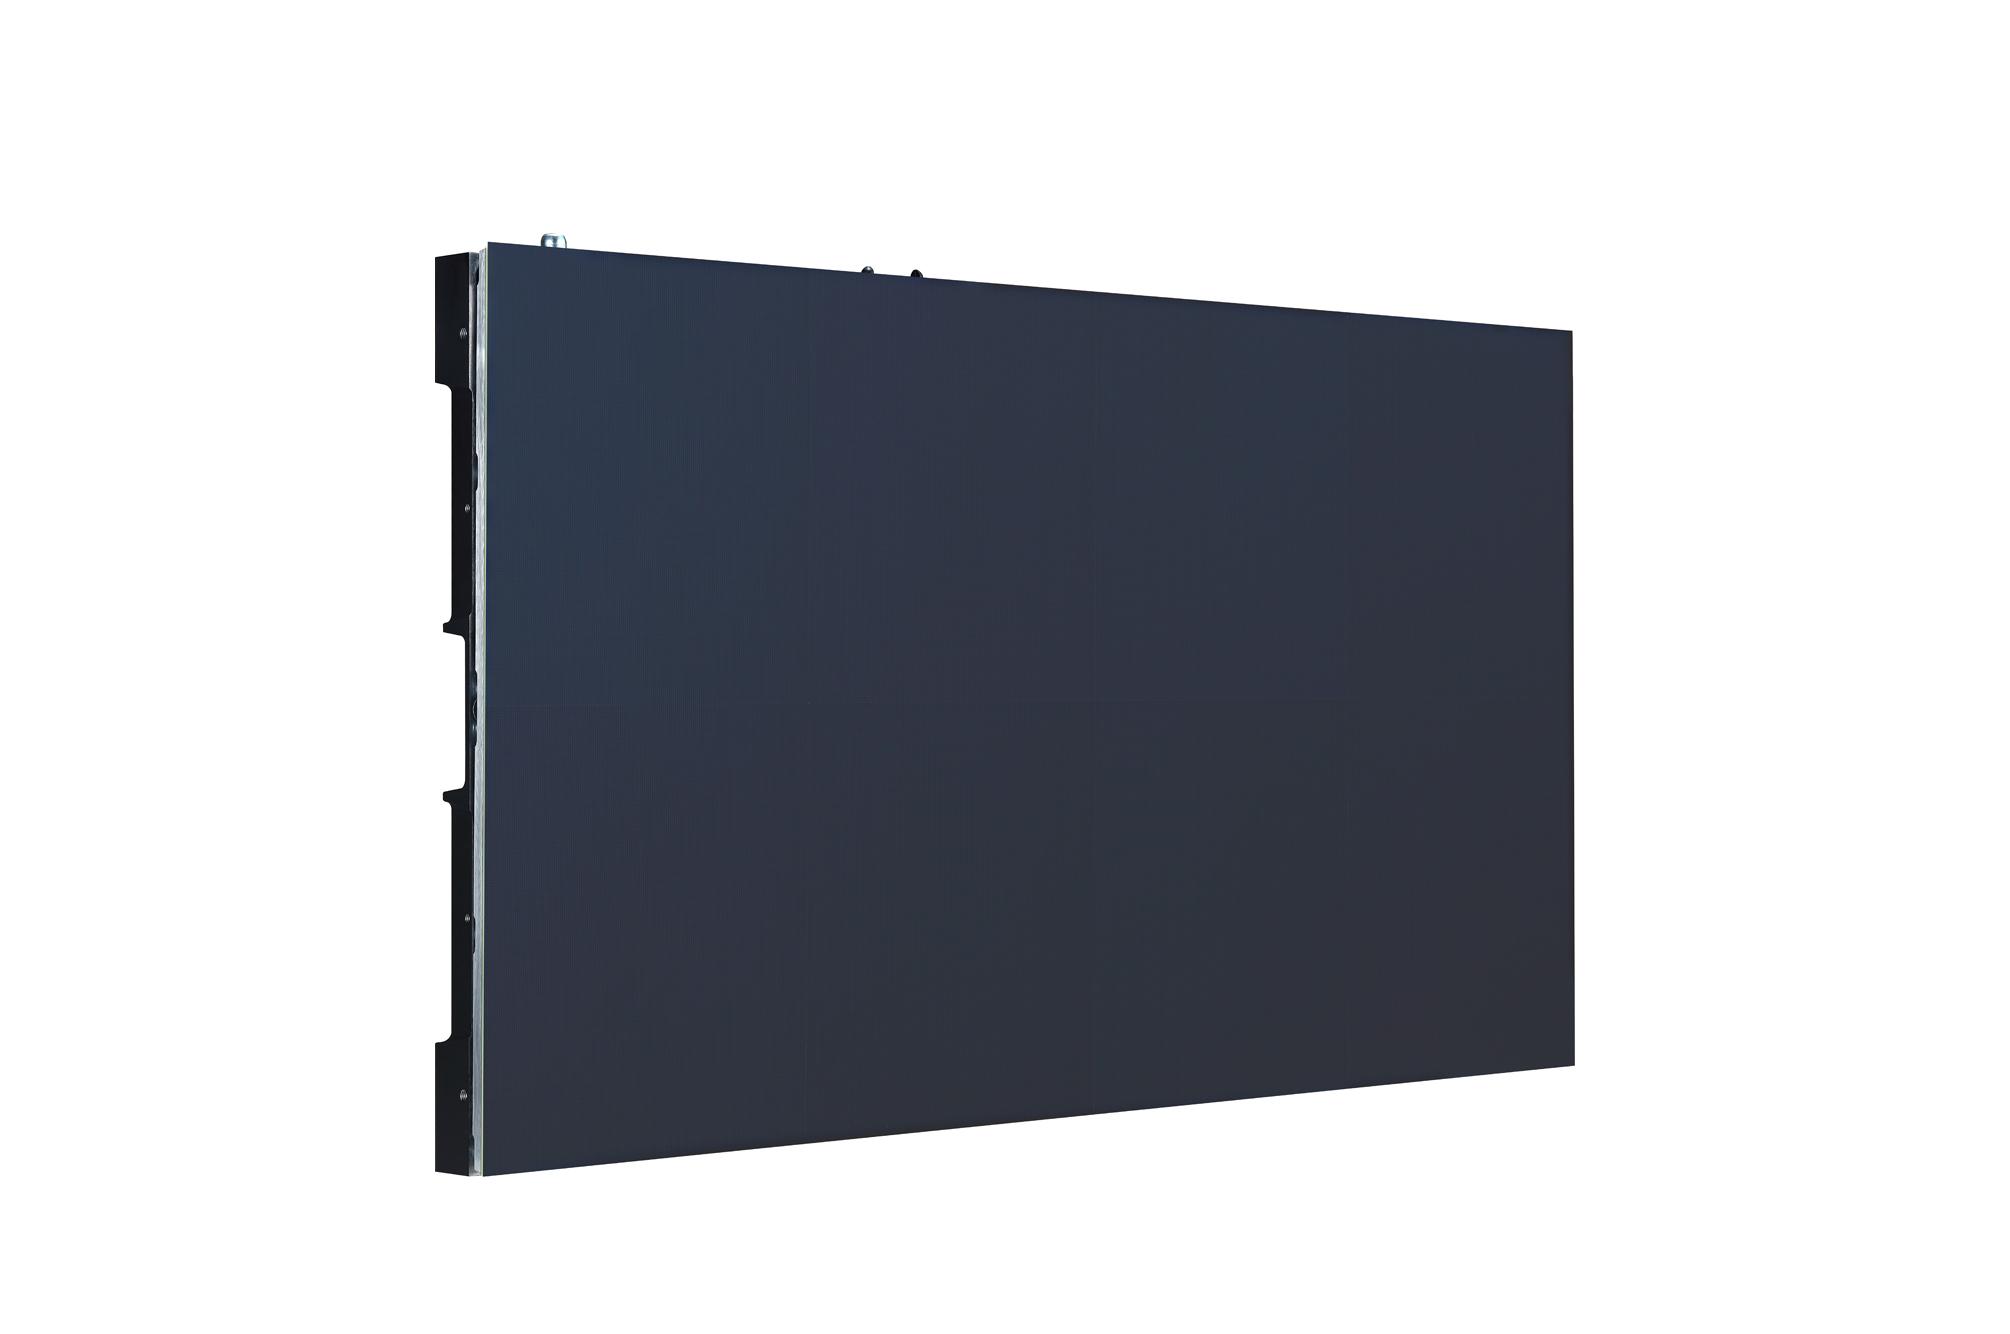 LG LG MAGNIT LSAB009 5